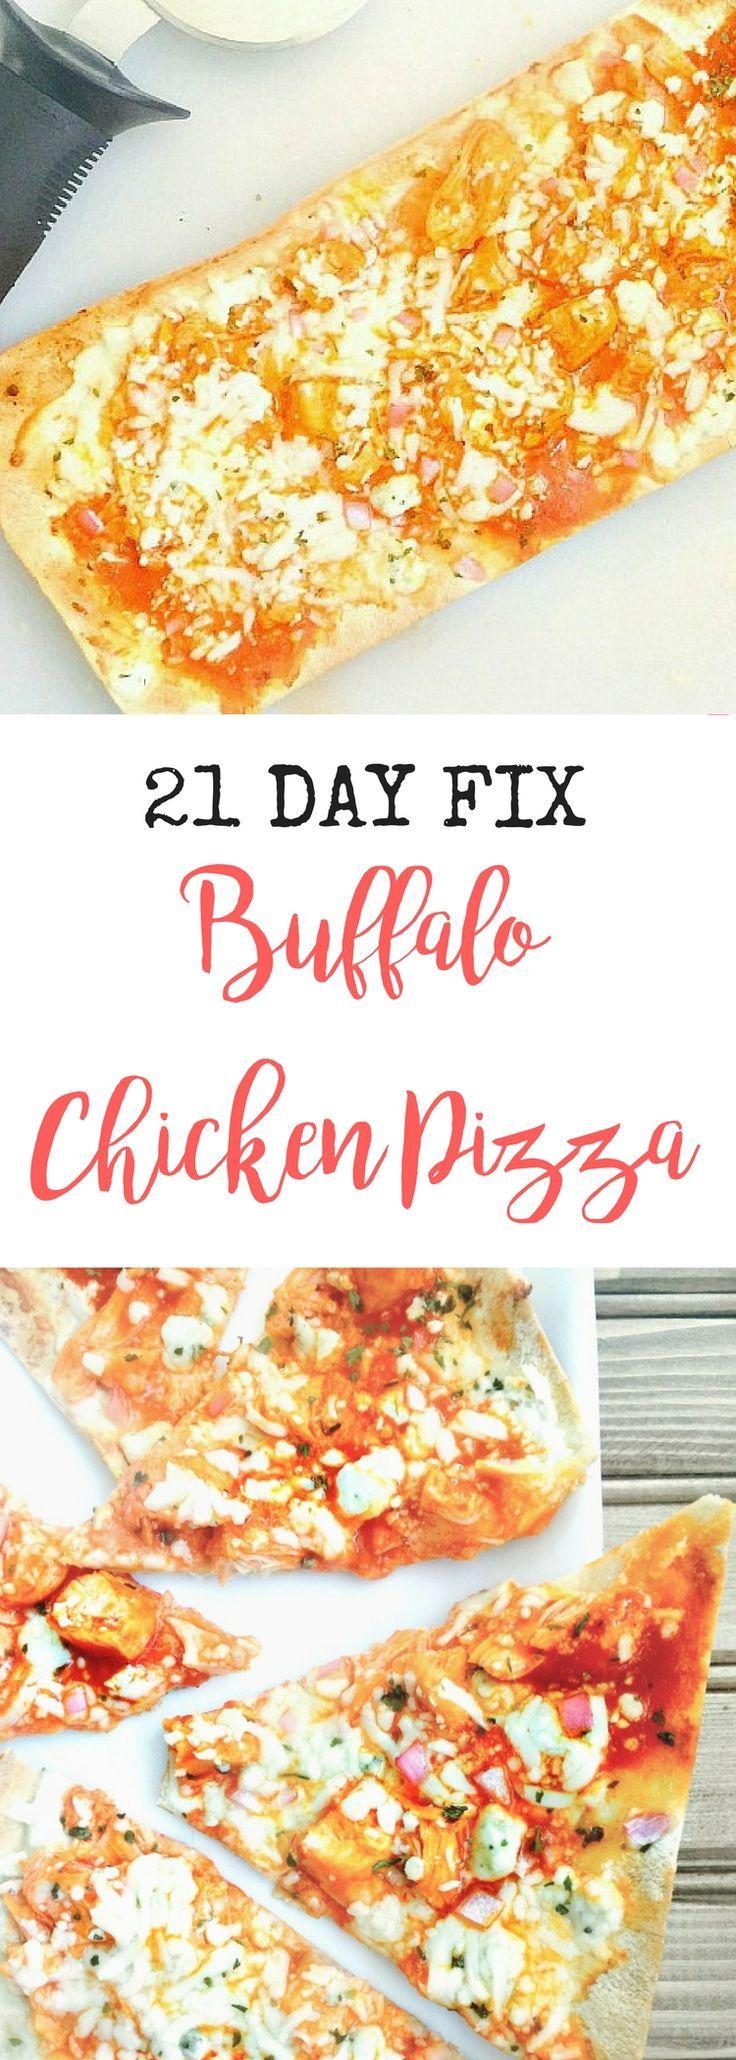 21 Day Fix Buffalo Chicken Pizza